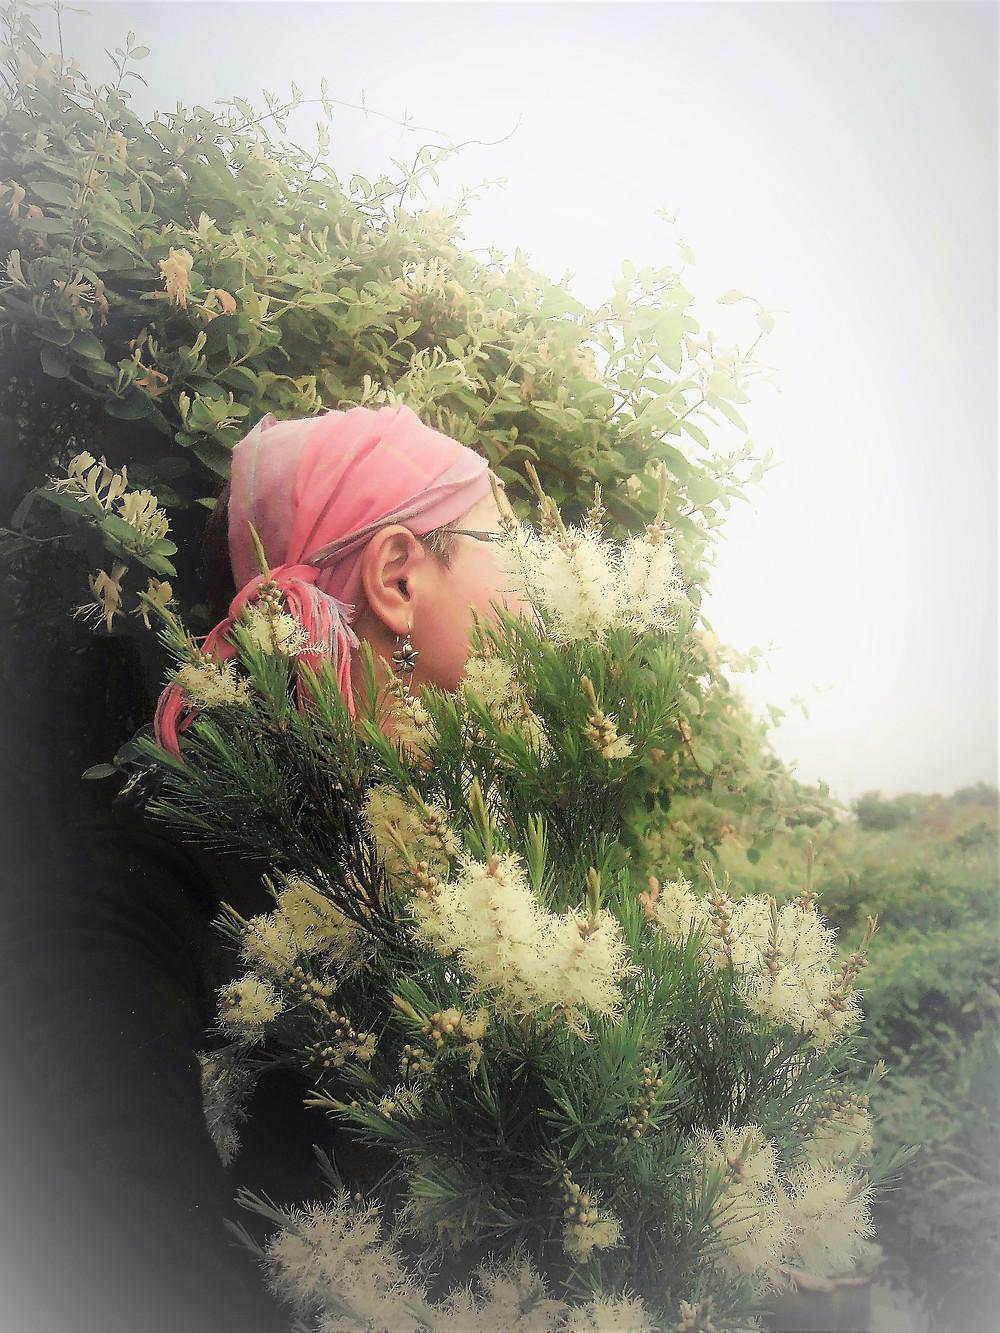 Cynthia harvested Australian Tea Tree